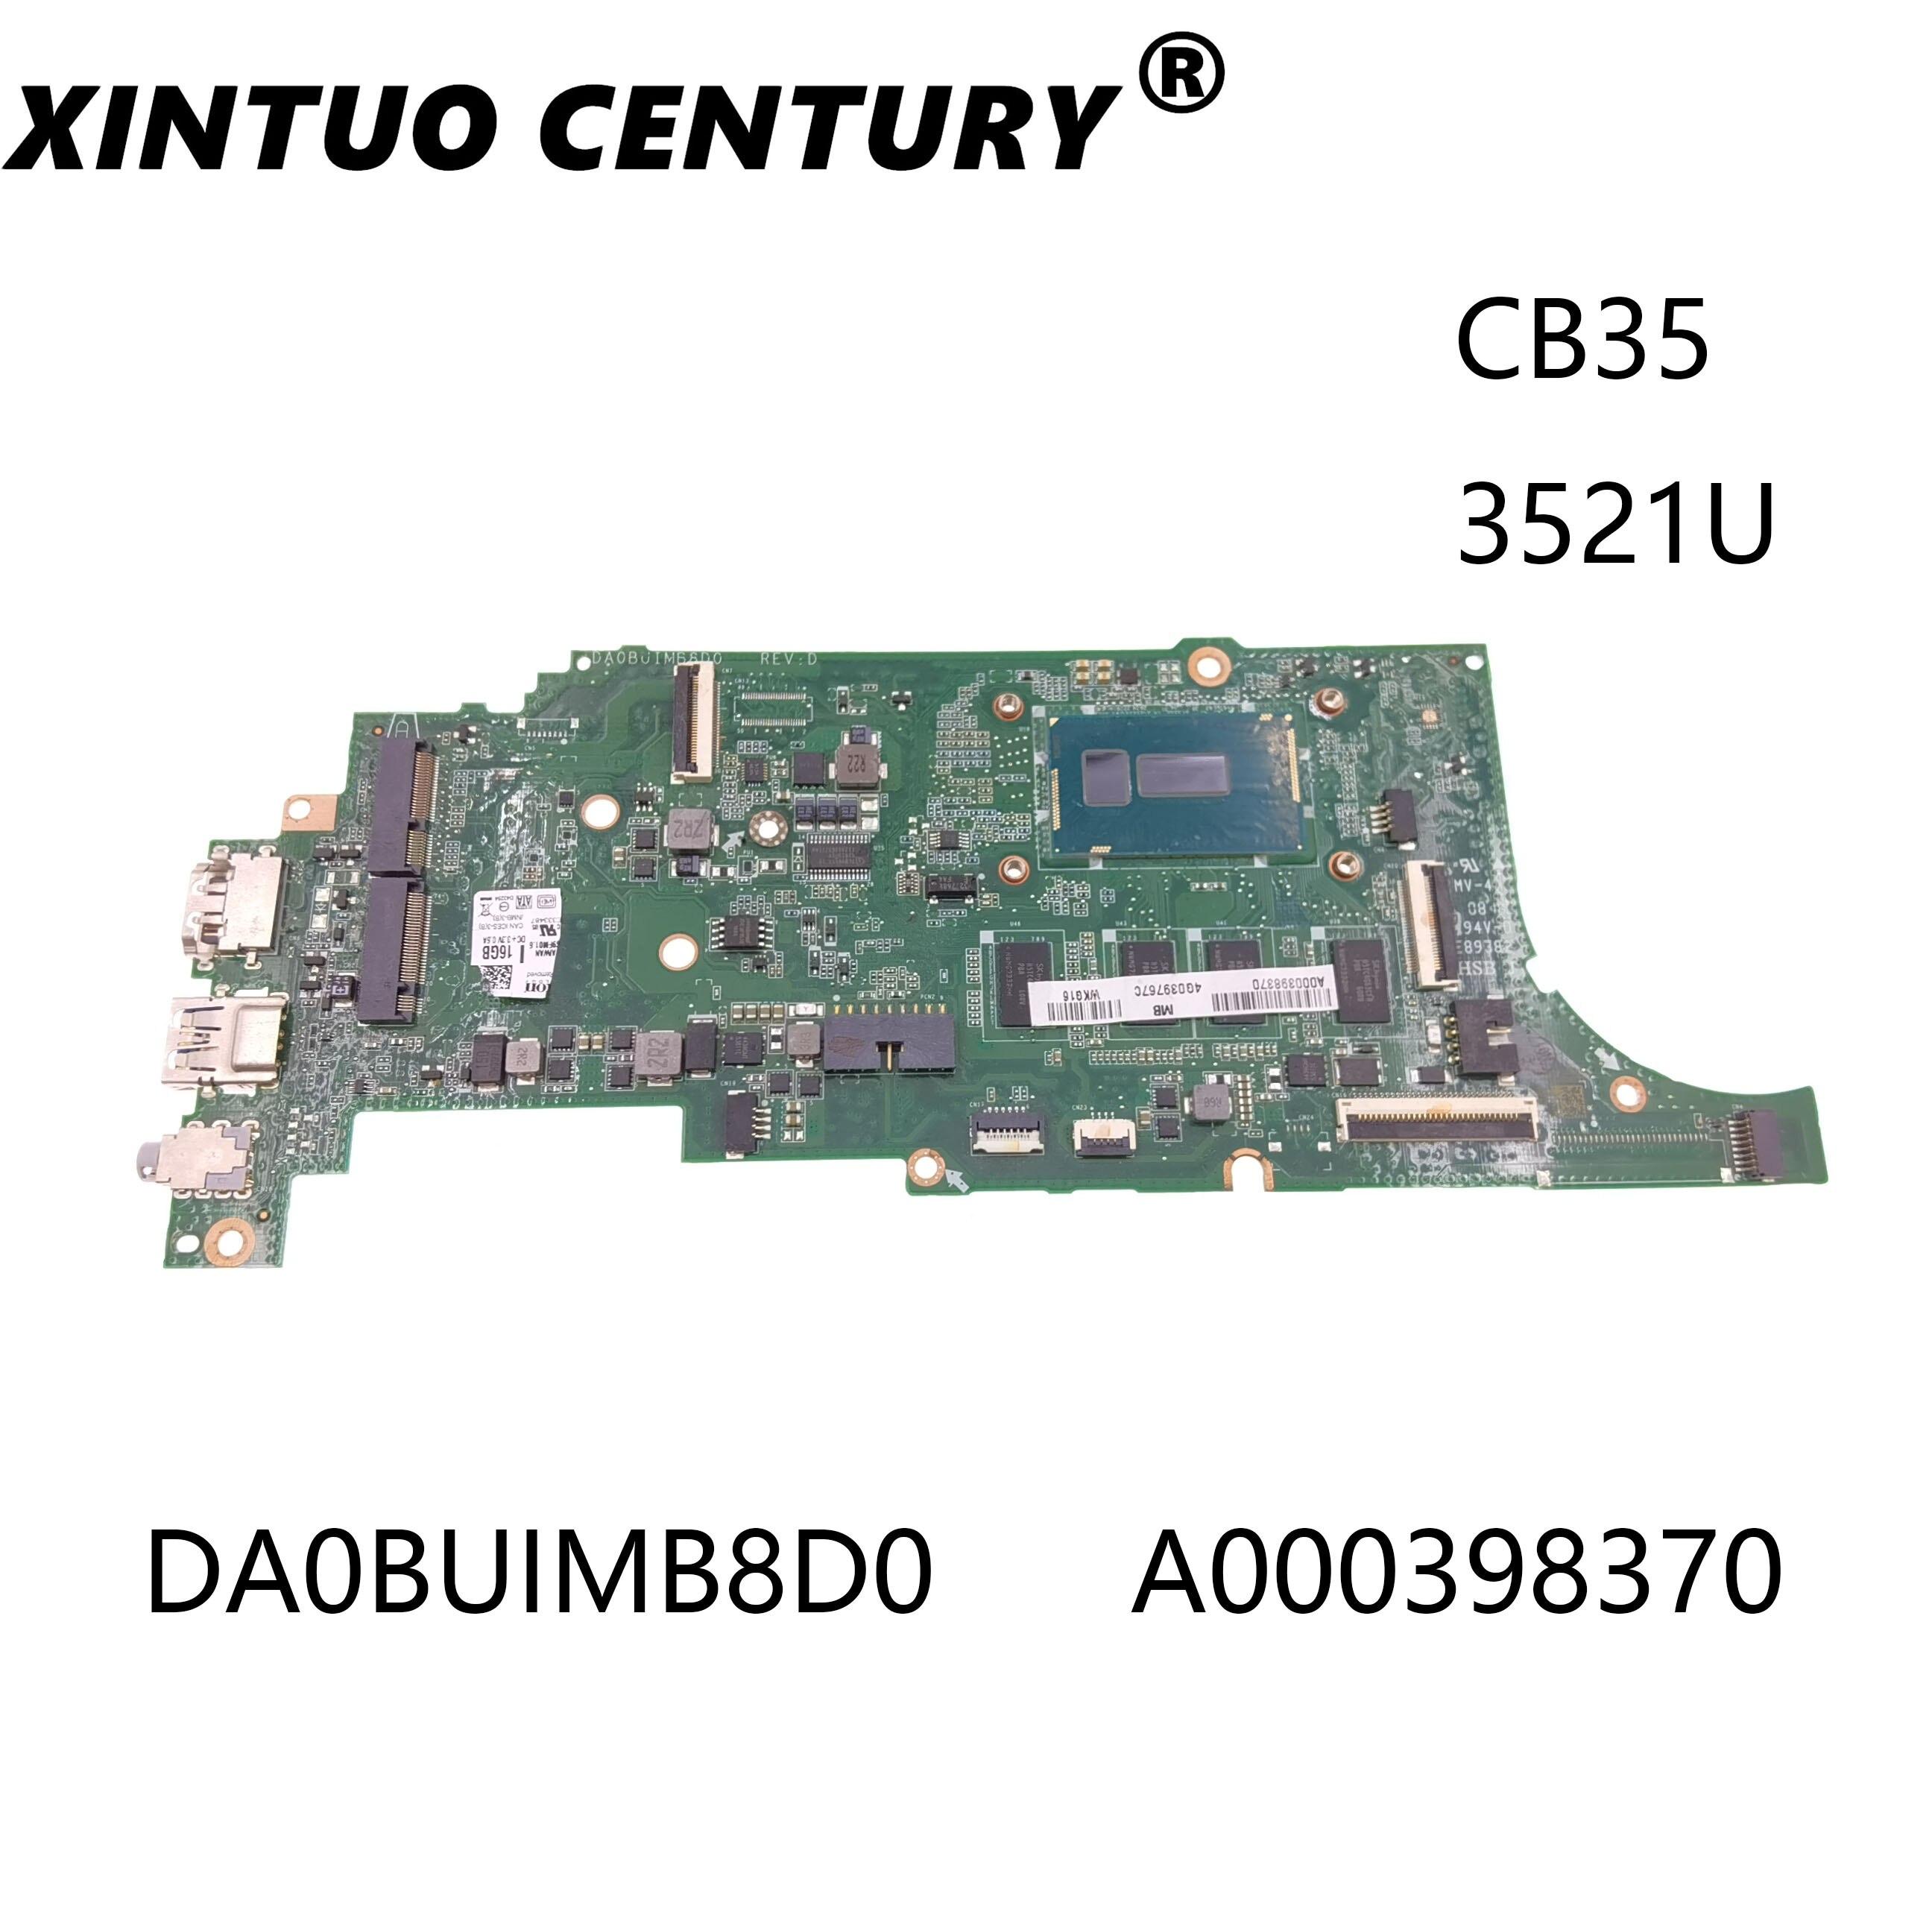 DA0BUIMB8D0 A000398370 ينطبق على CB35 الكمبيوتر المحمول توشيبا. SR243 3521U لديه مرت 100% اختبار